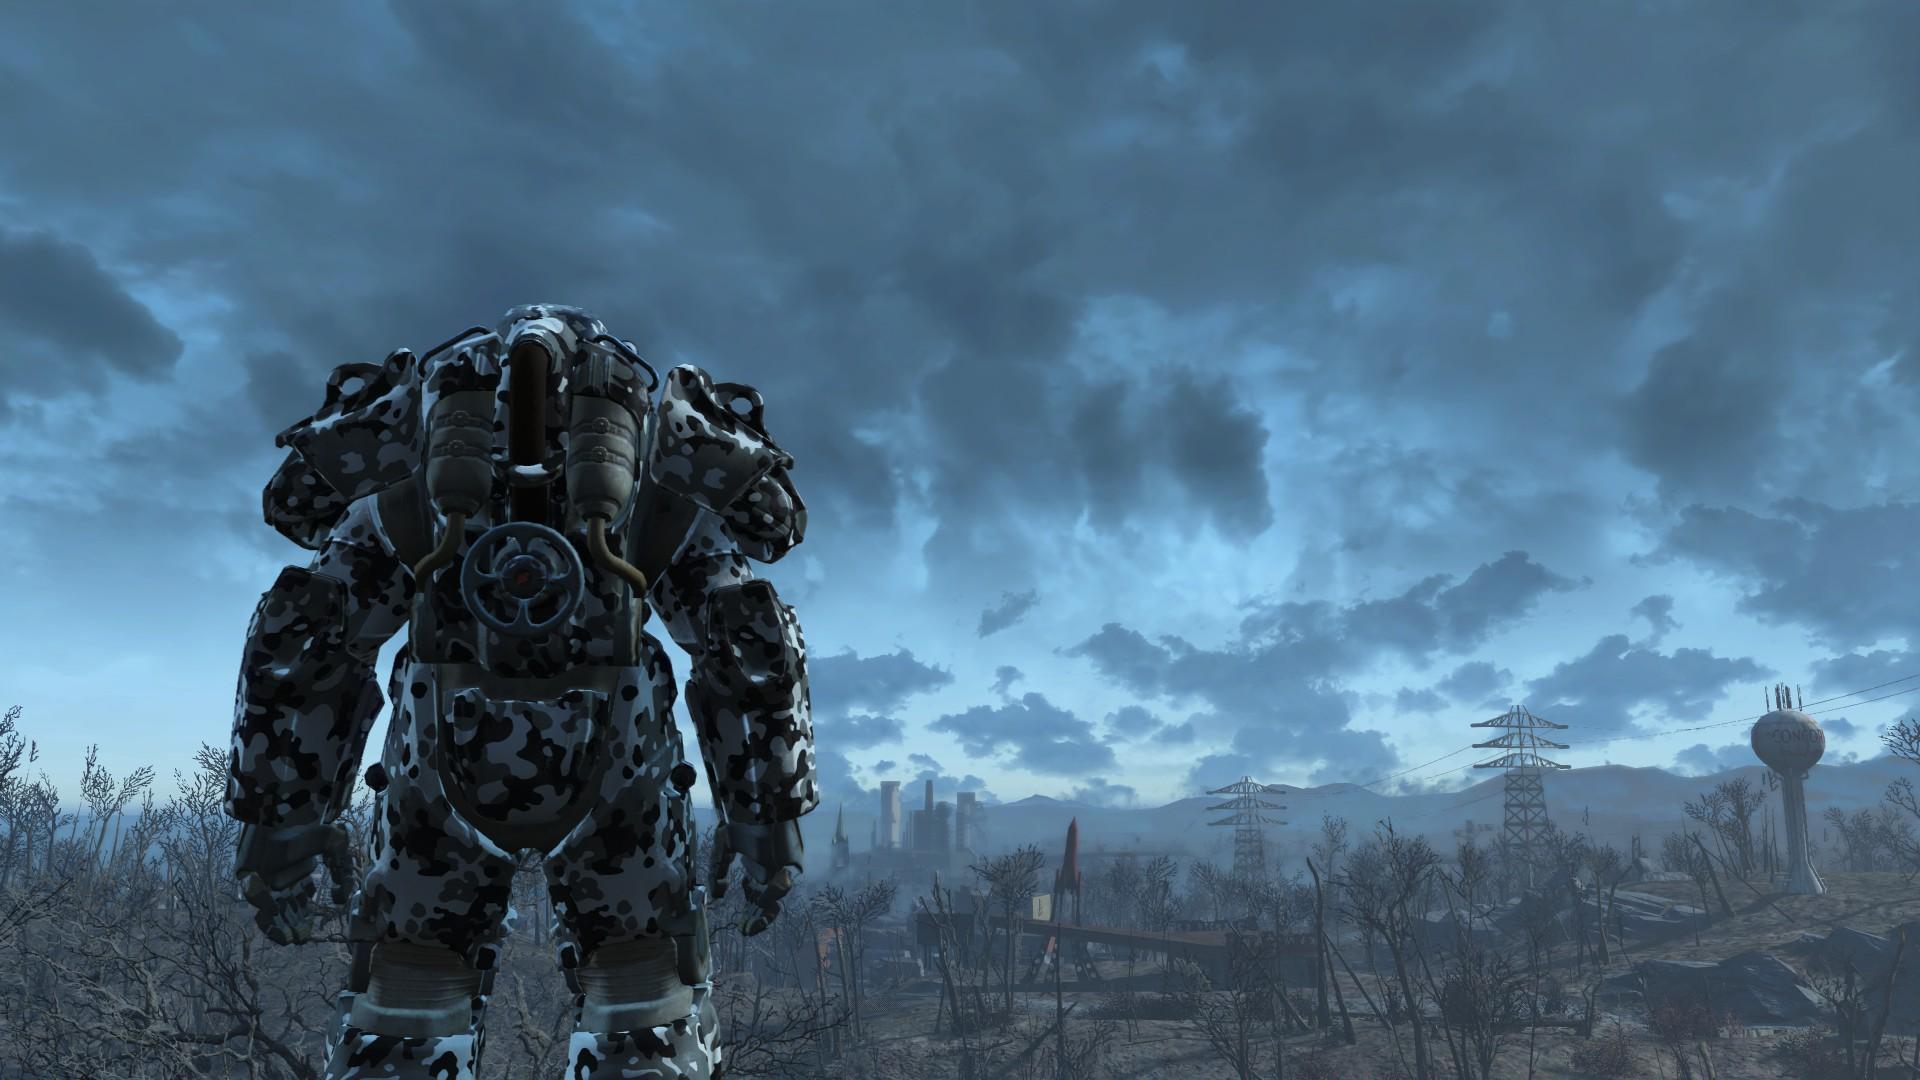 20190406163258_1.jpg - Fallout 4